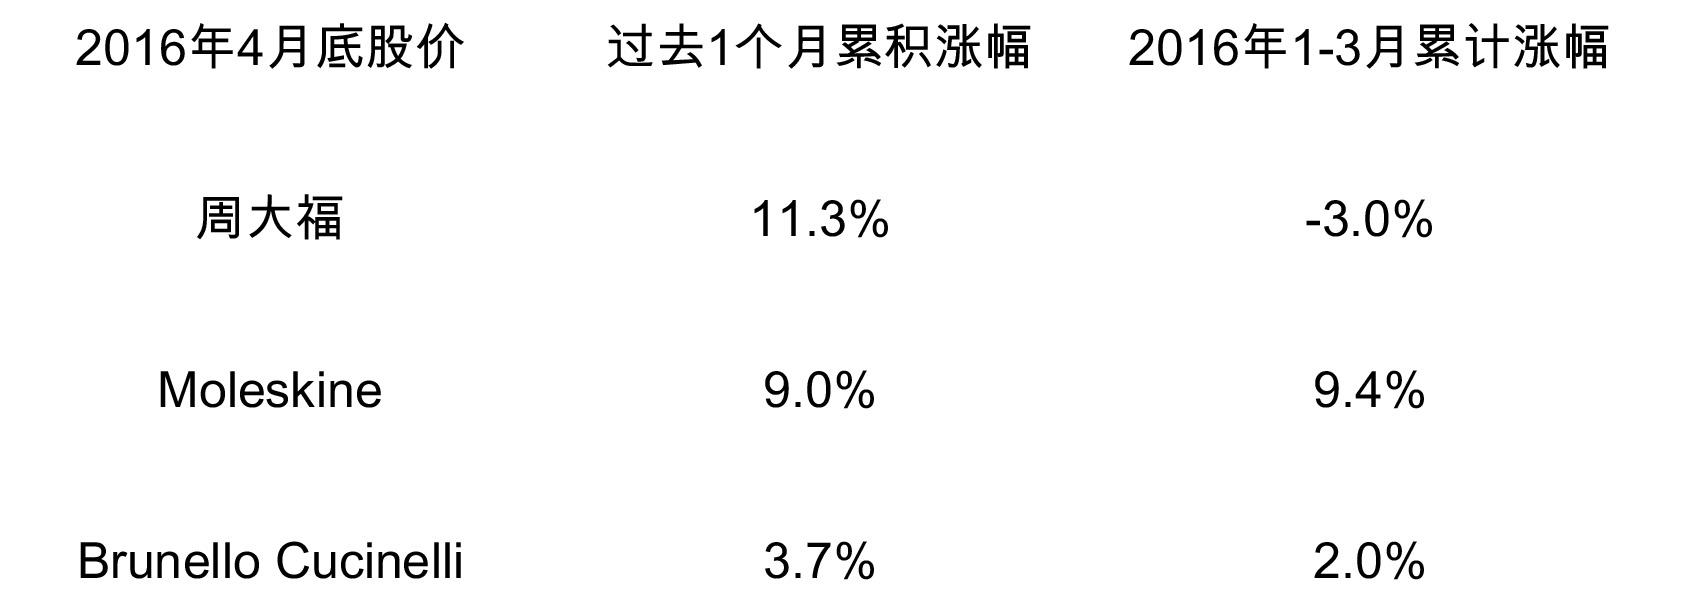 stock Price 2016 (自动保存的)